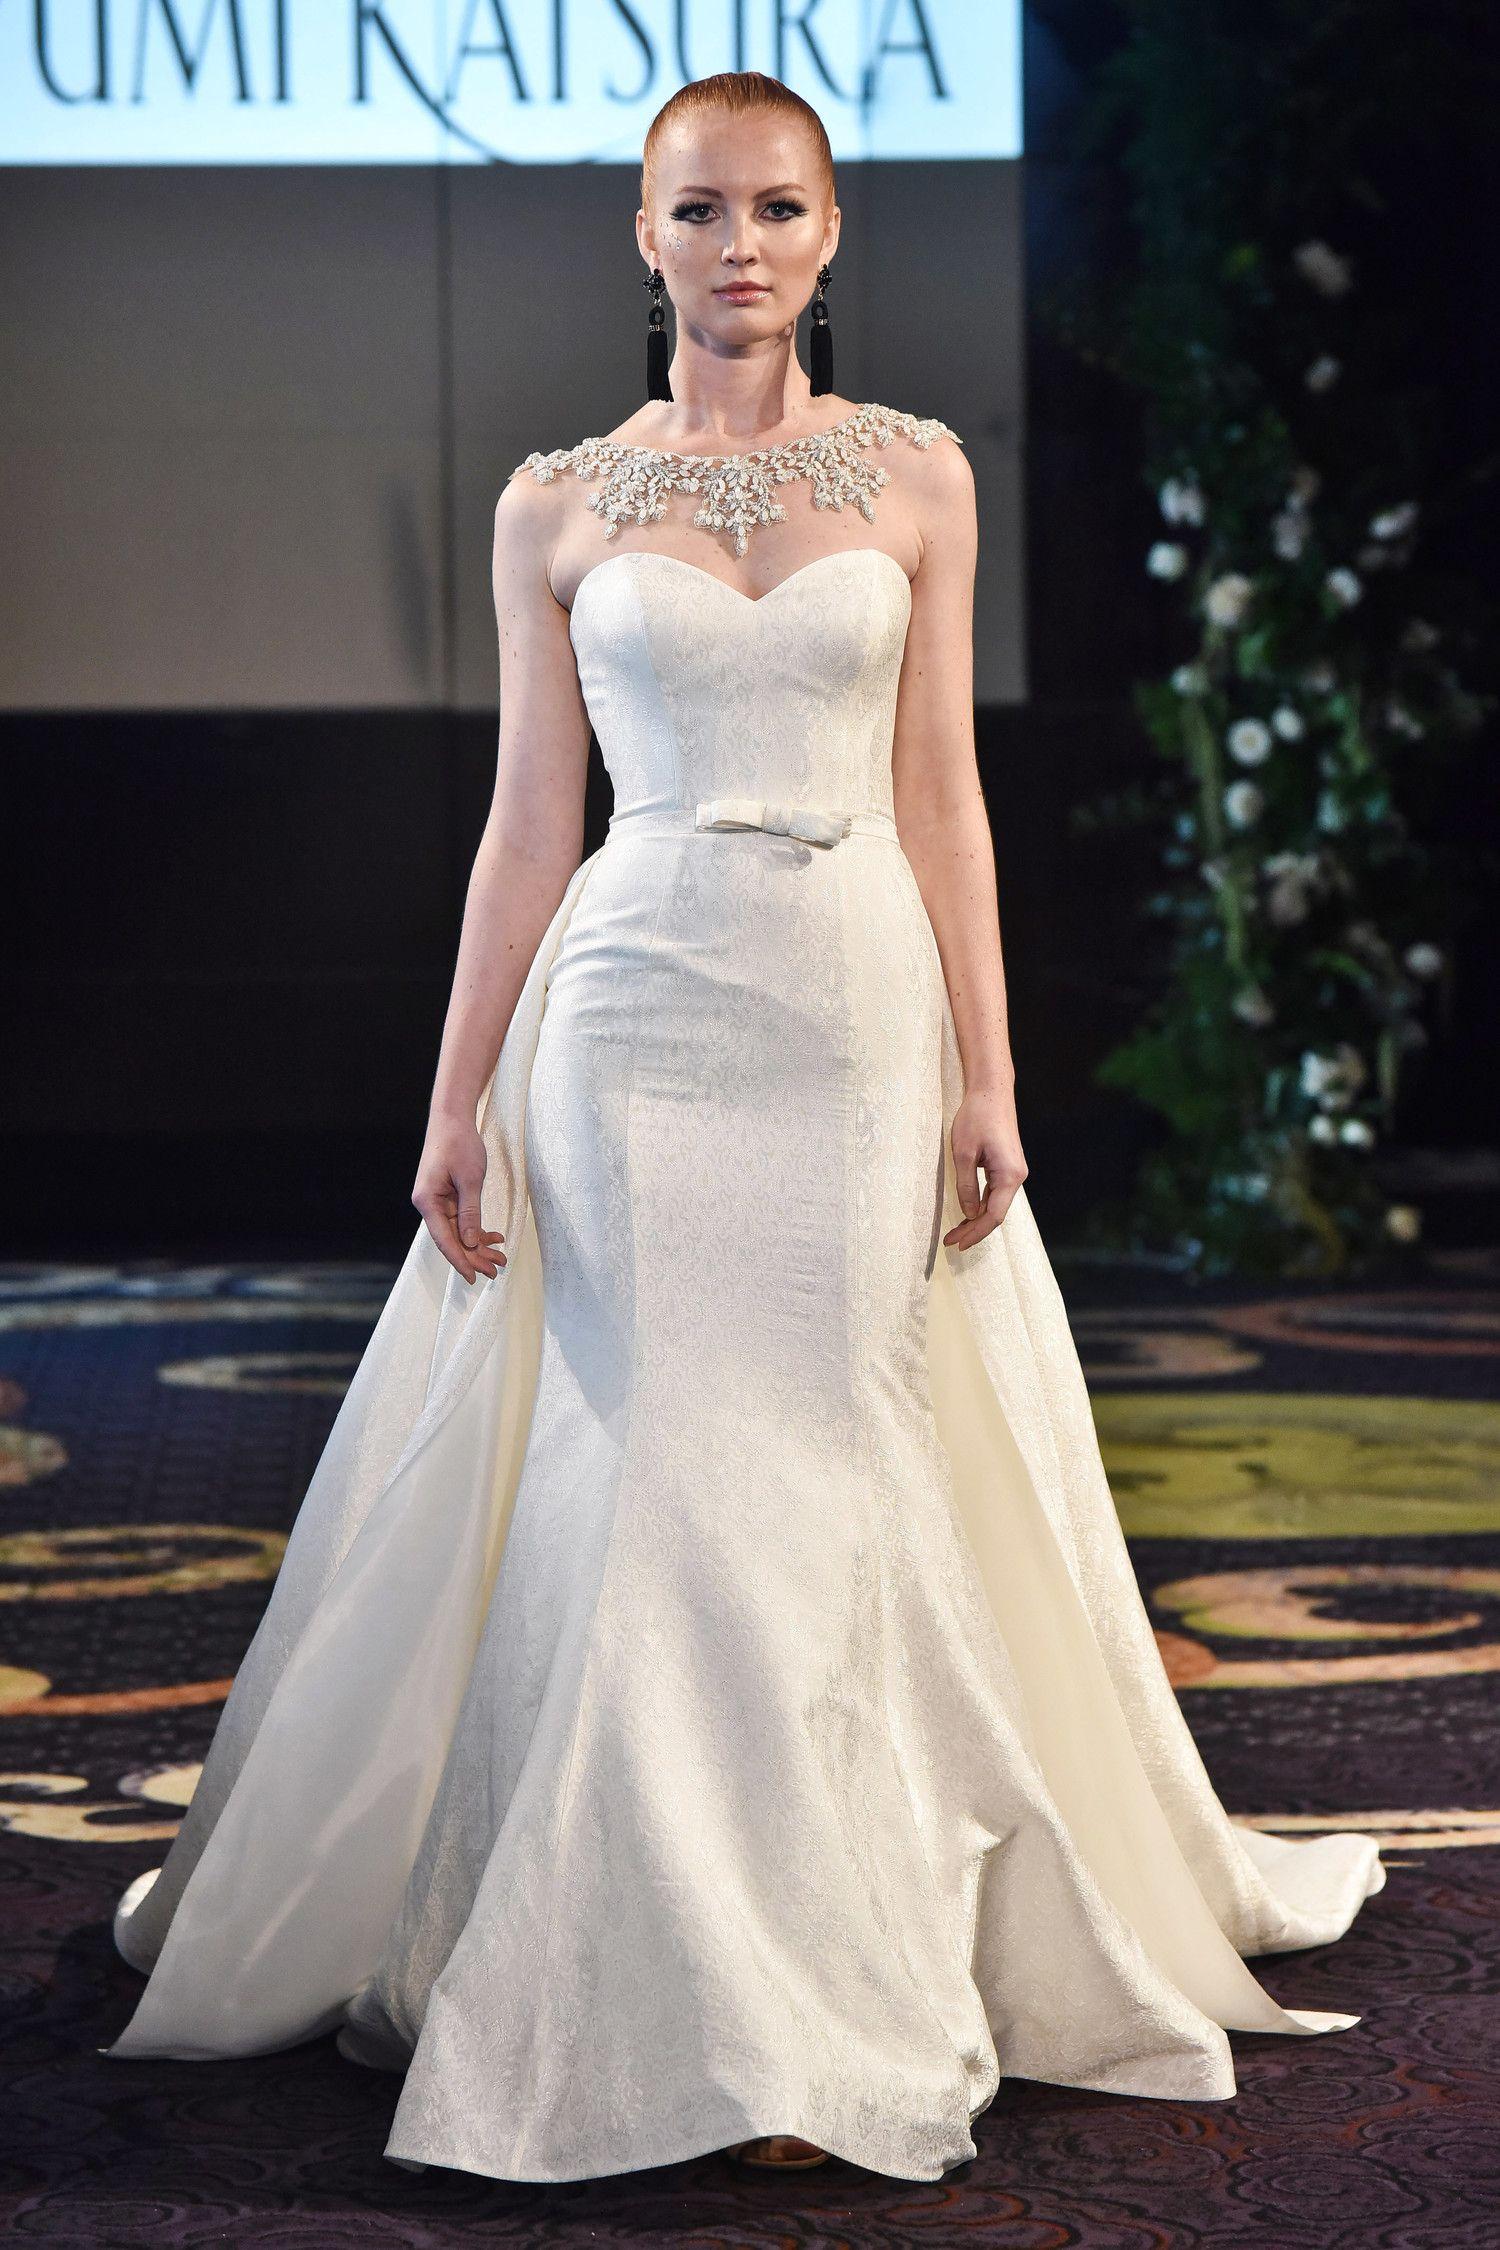 Wedding dress by Yumi Katsura | wearable luxe | Pinterest | Trumpets ...